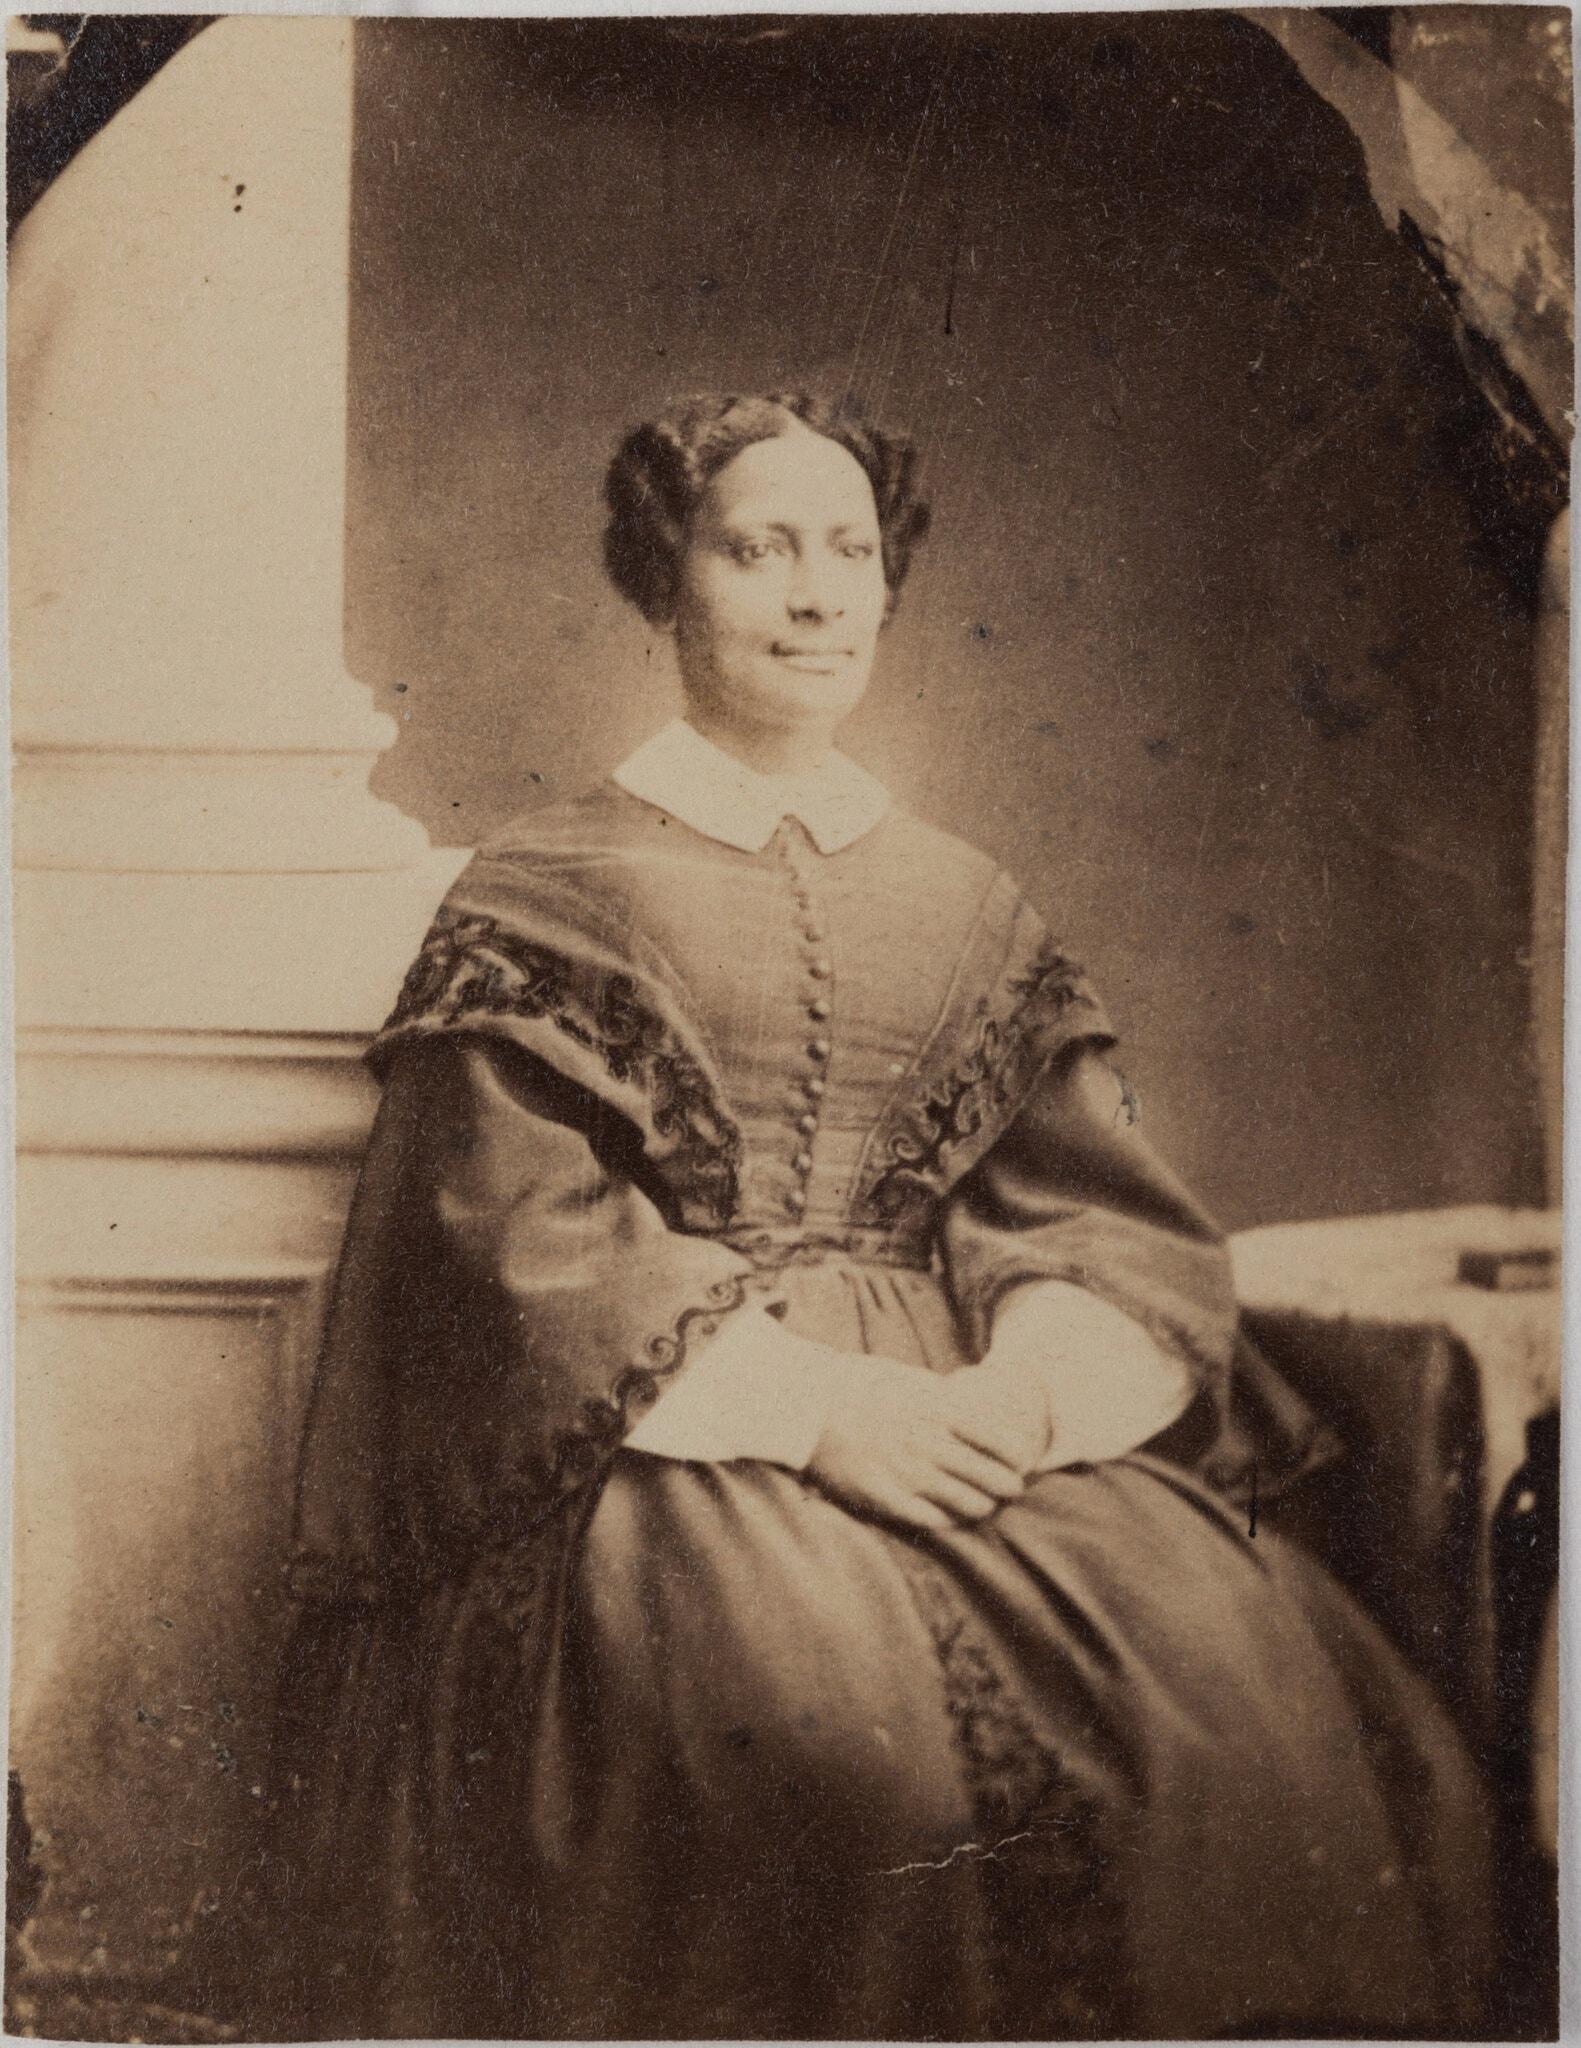 Sarah Parker Remond American abolitionist and suffragist